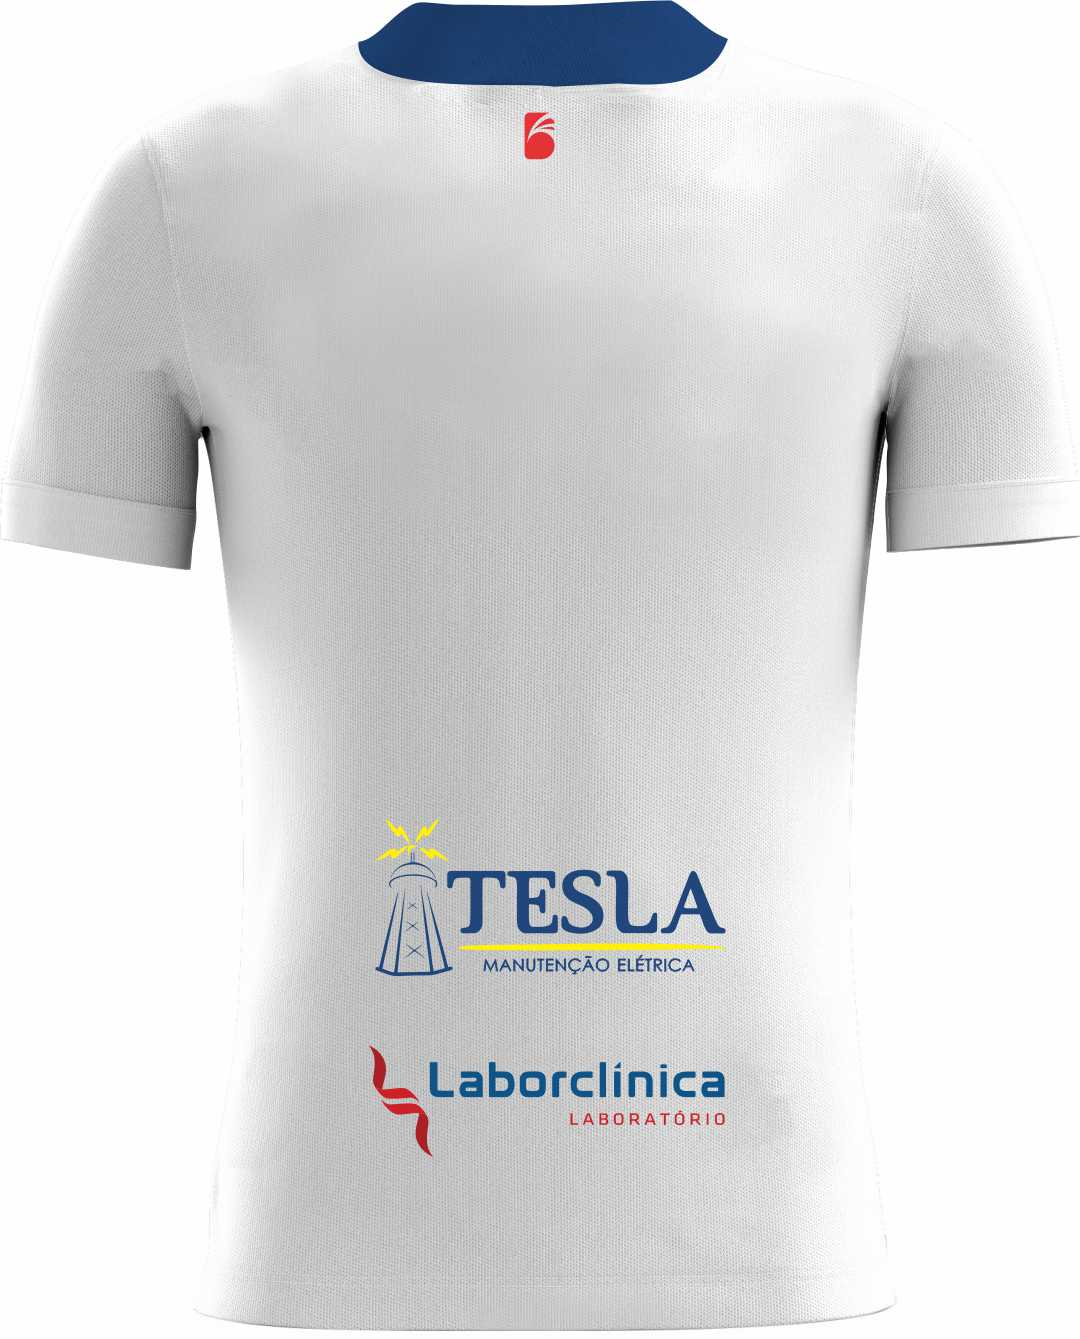 Camisa Of. Betim Futebol Mod.2 JOGADOR Infantil 2021